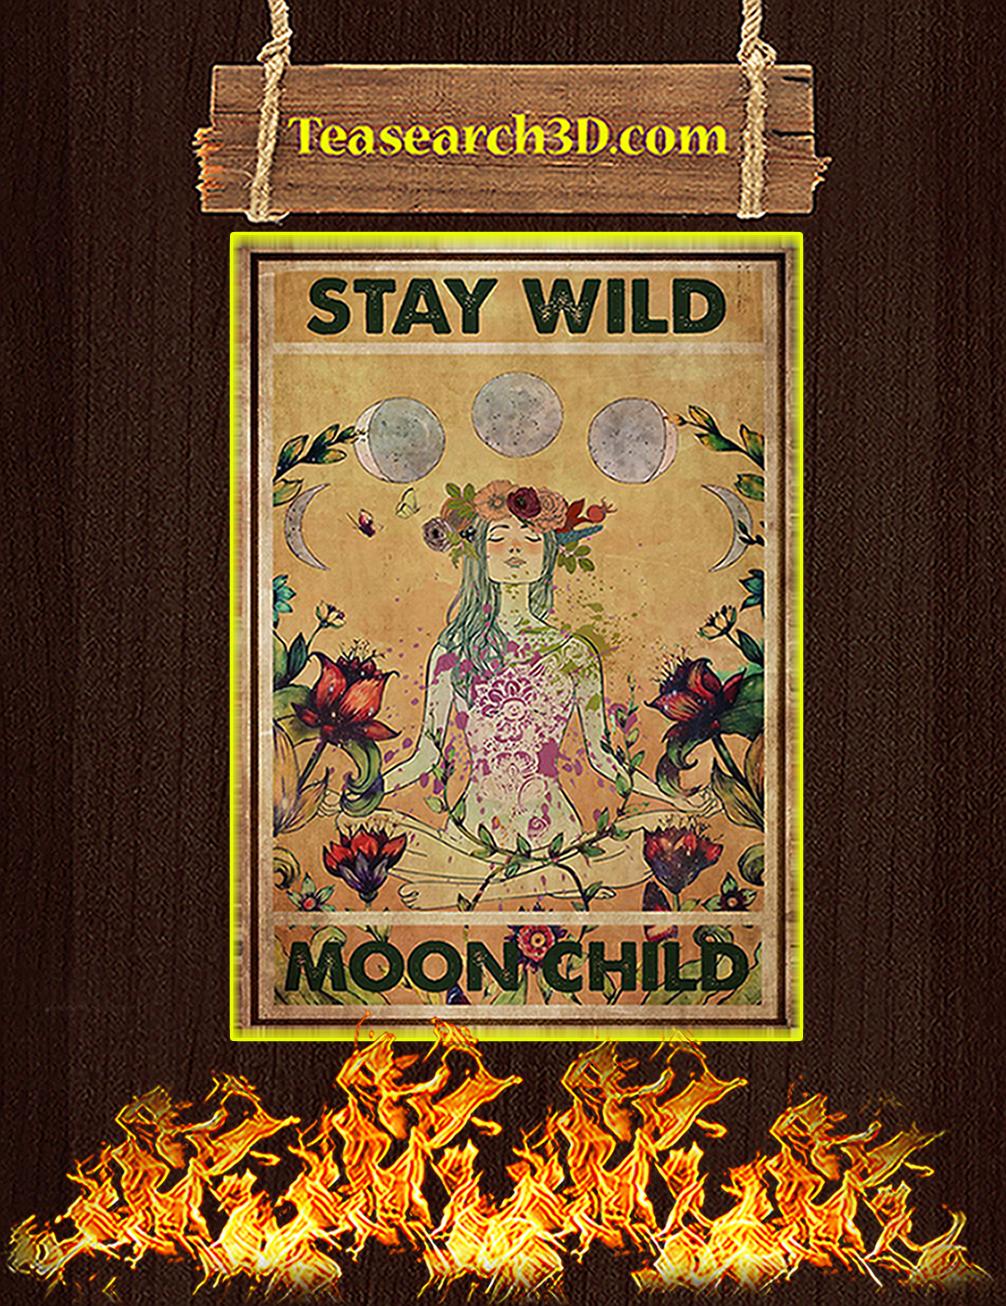 Hippie yoga stay wild moon child poster